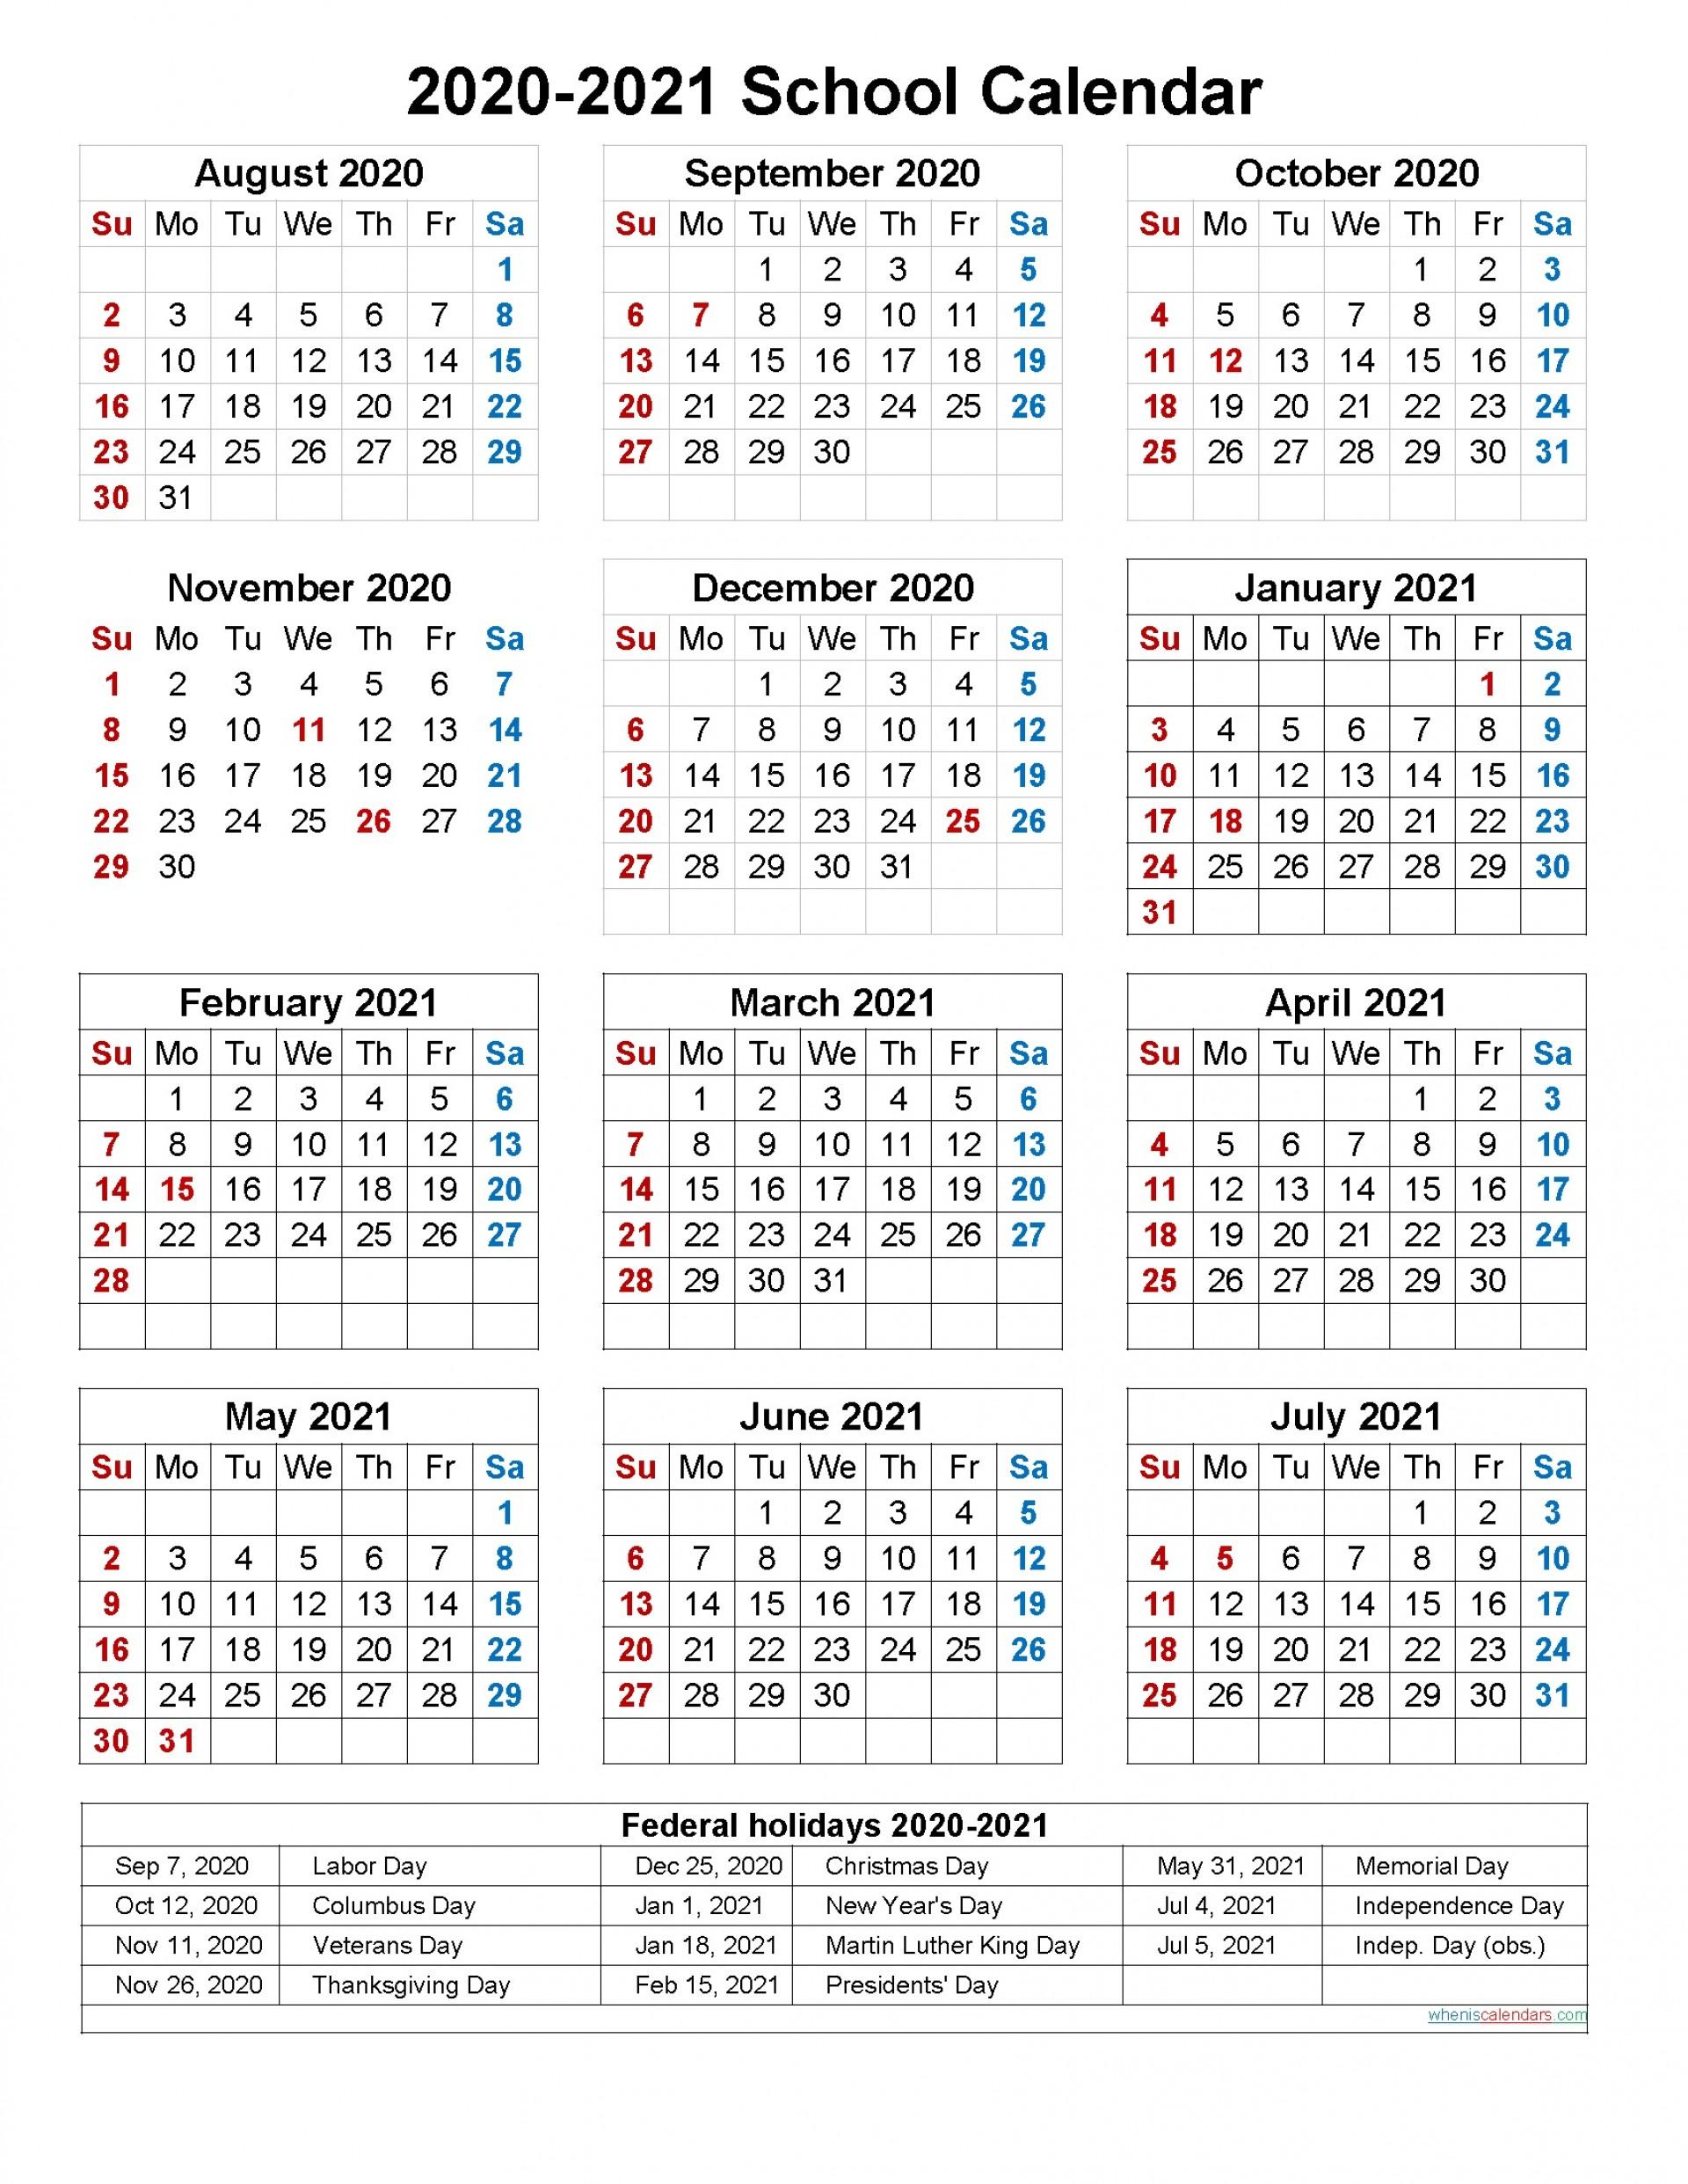 005 Dreaded School Year Calendar Template Image  Excel 2019-20 Word1920